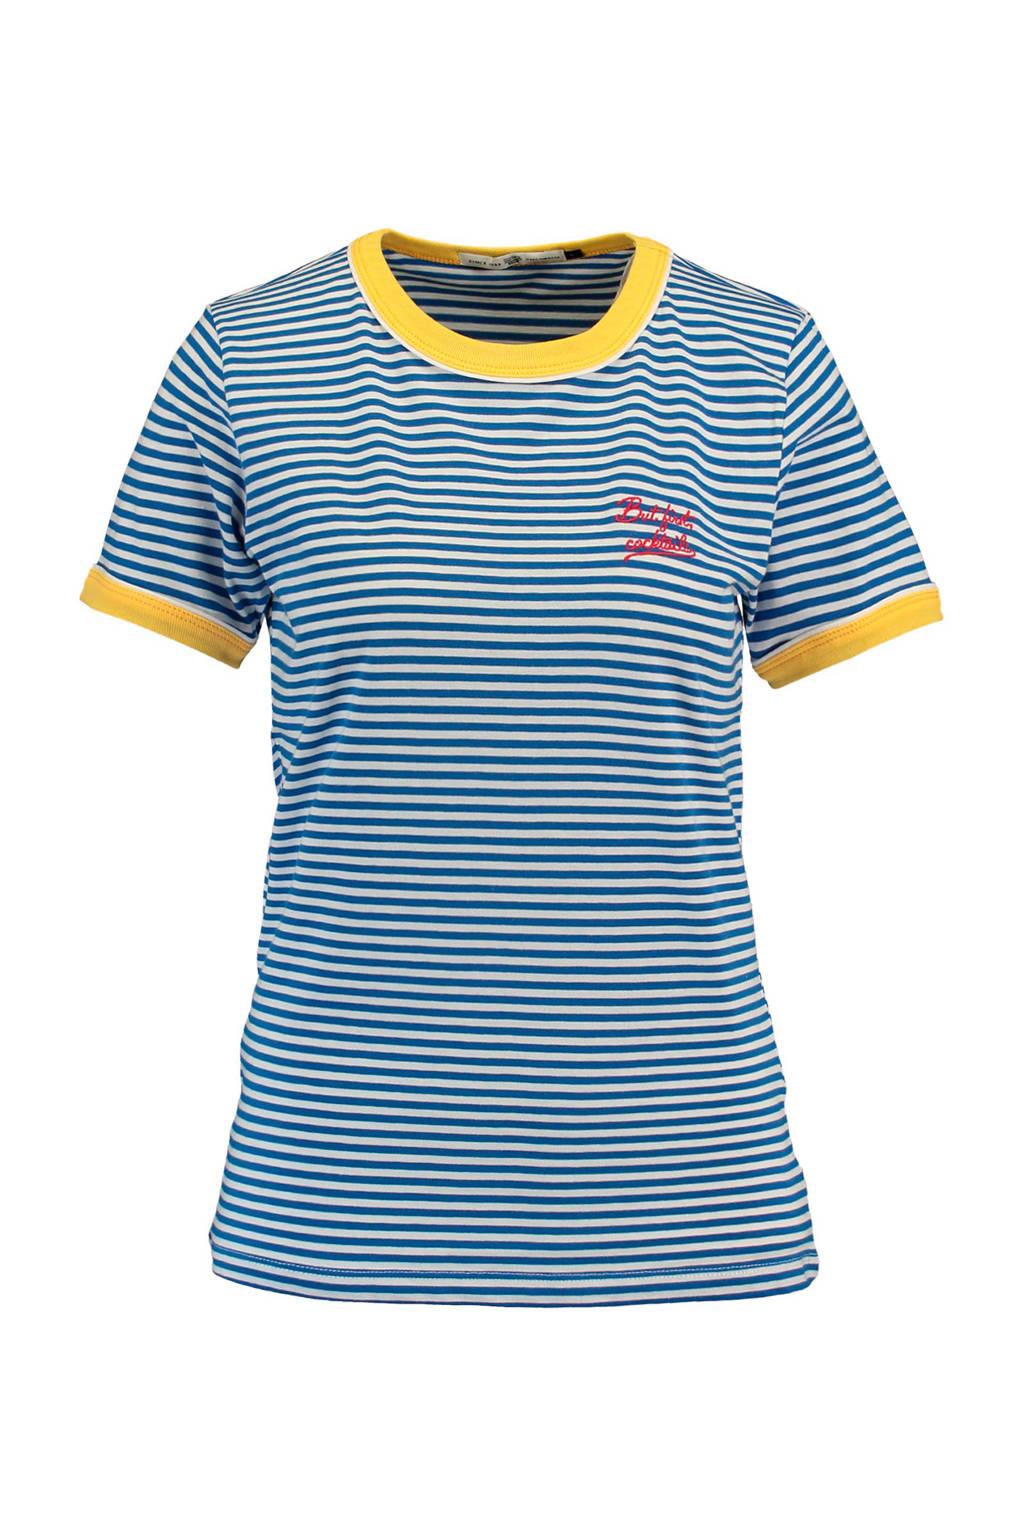 America Today T-shirt Erin, Blauw/wit